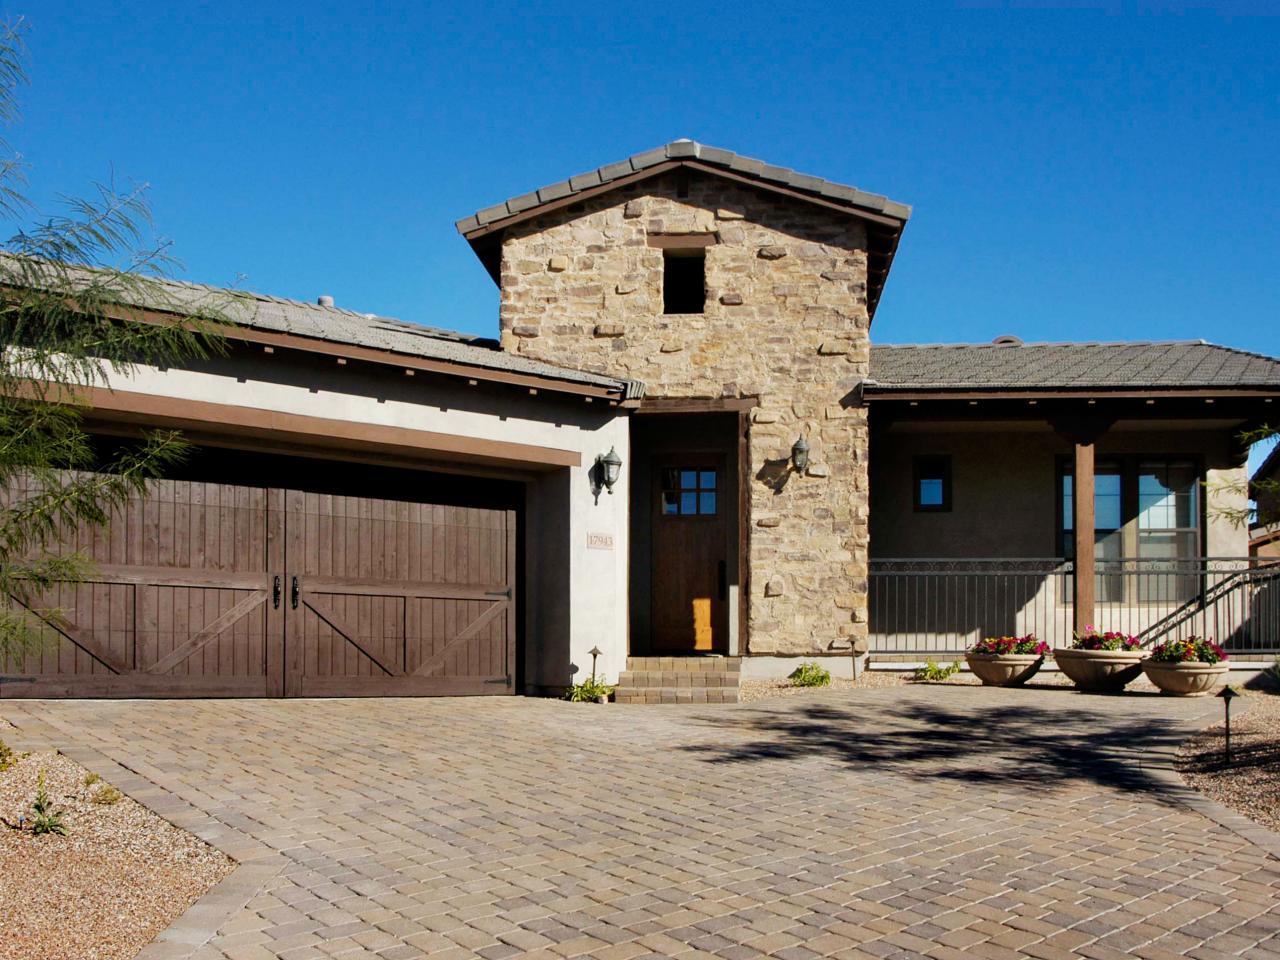 26 garage door designs home remodeling ideas for for Stone garage designs